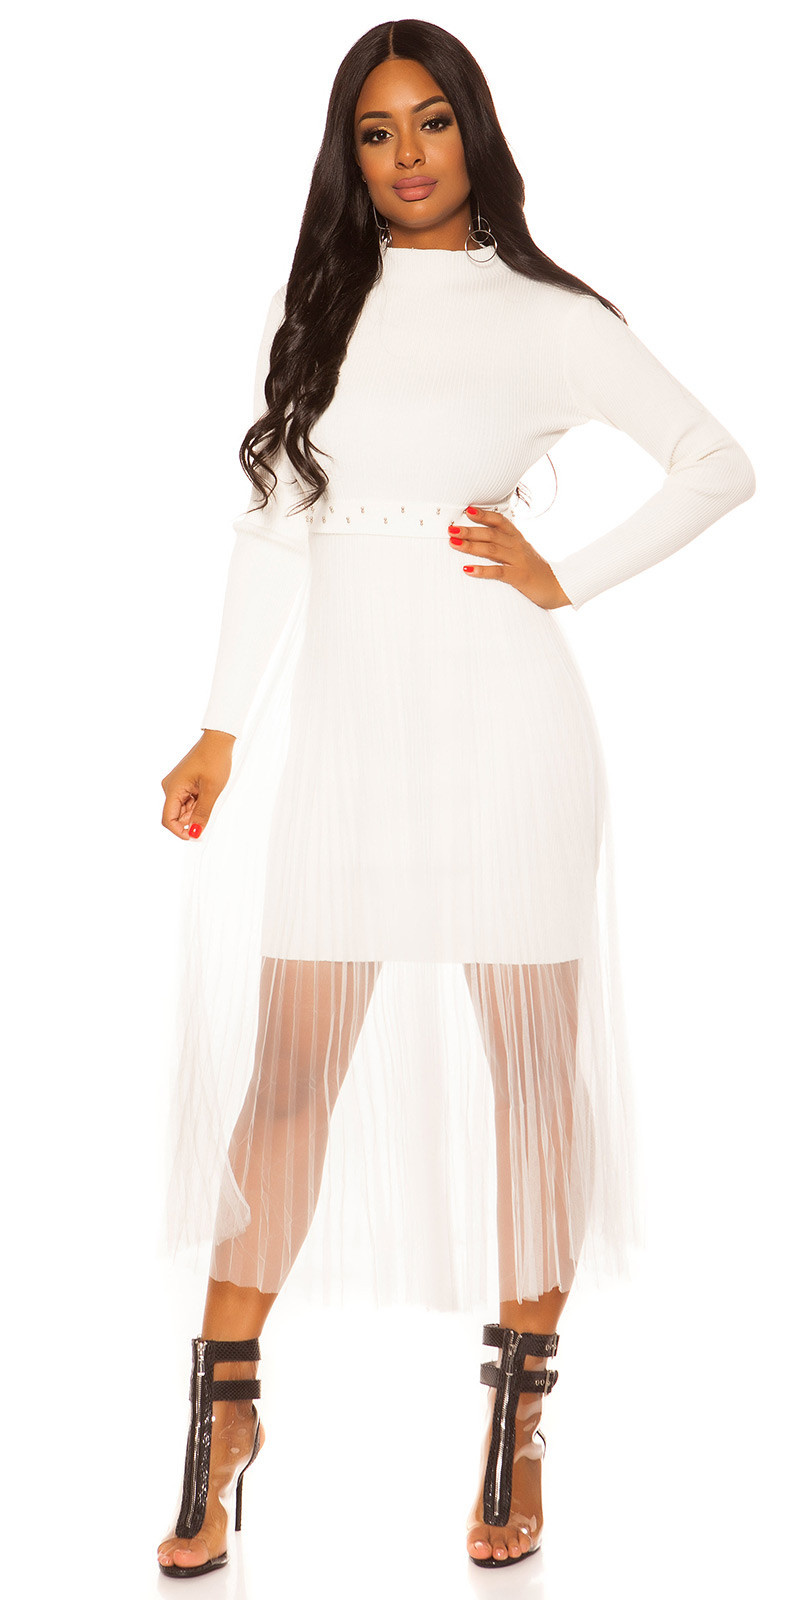 Sexy rib gebreide jurk met chiffon overrok wit